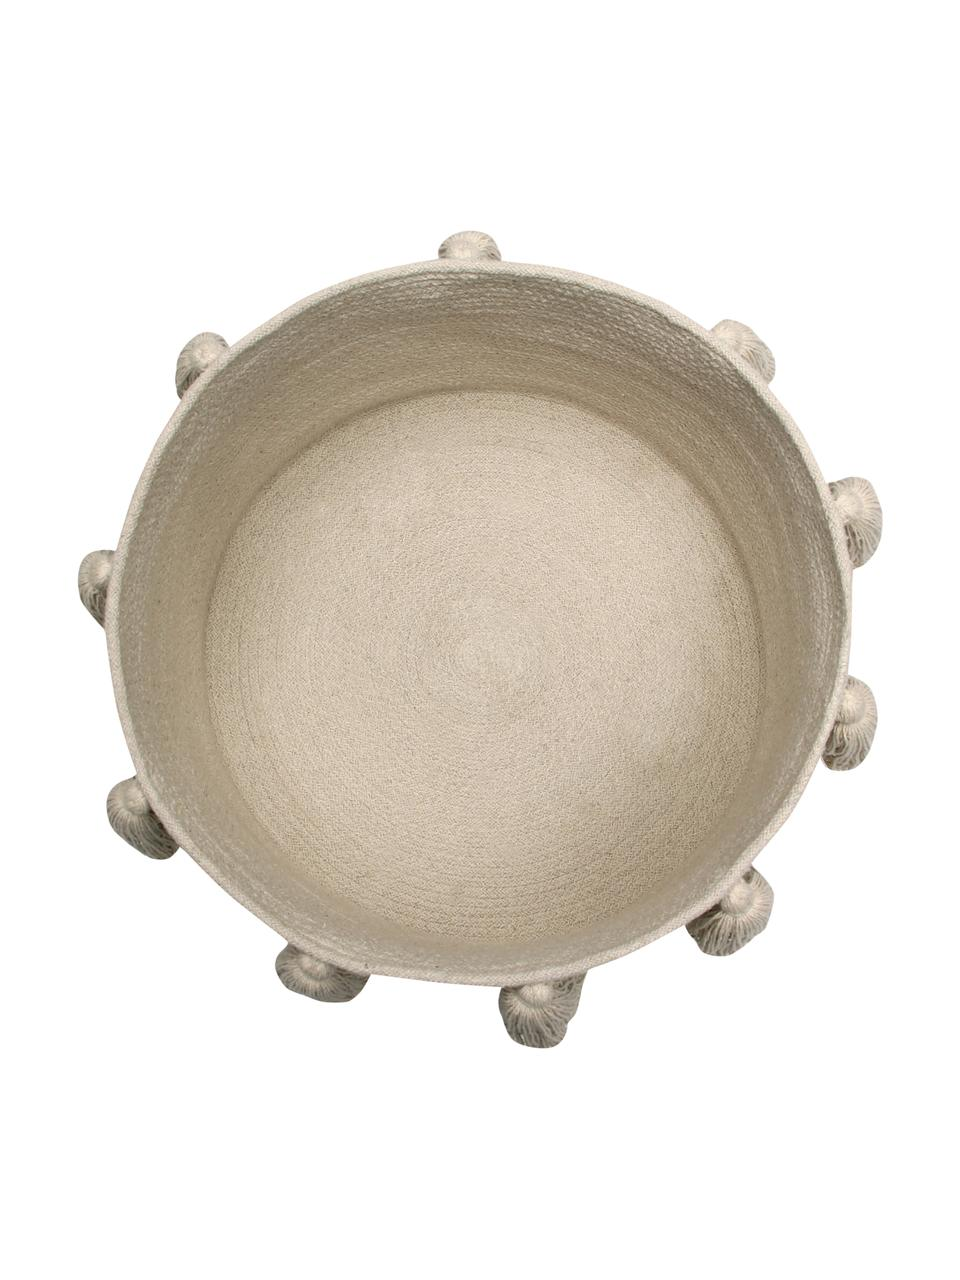 Cesto Tassels, 97% cotone, 3% cotone riciclato, Beige, Ø 45 x Alt. 30 cm